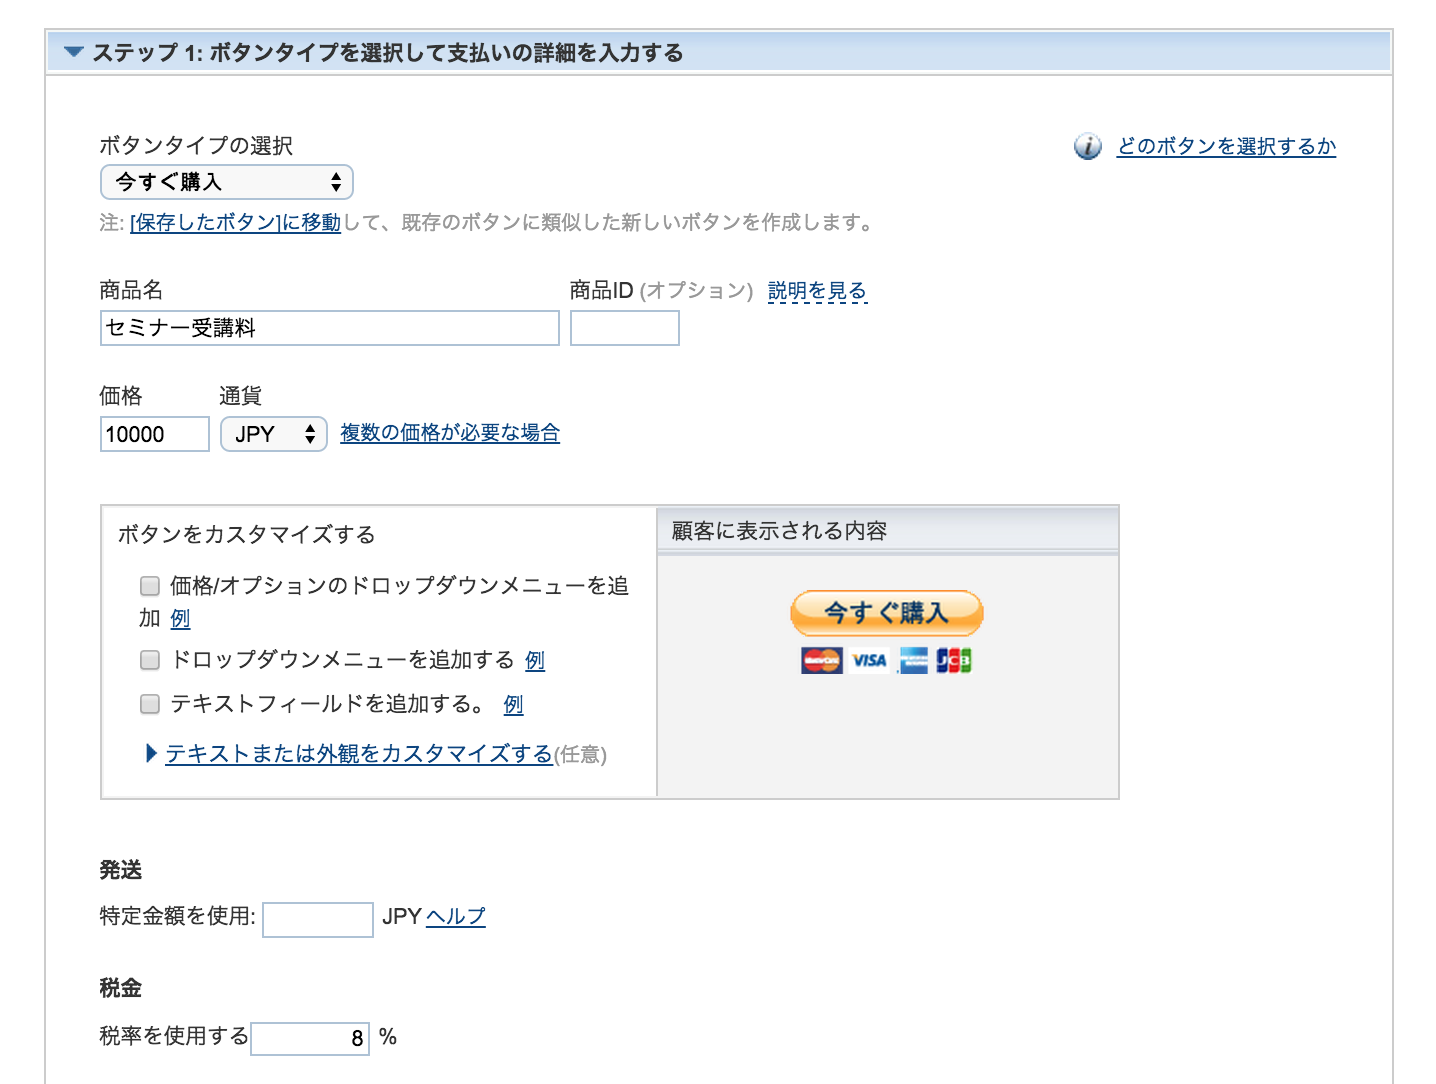 https://www.agentmail.jp/image/?i=3tWqz9QK9EA%3D